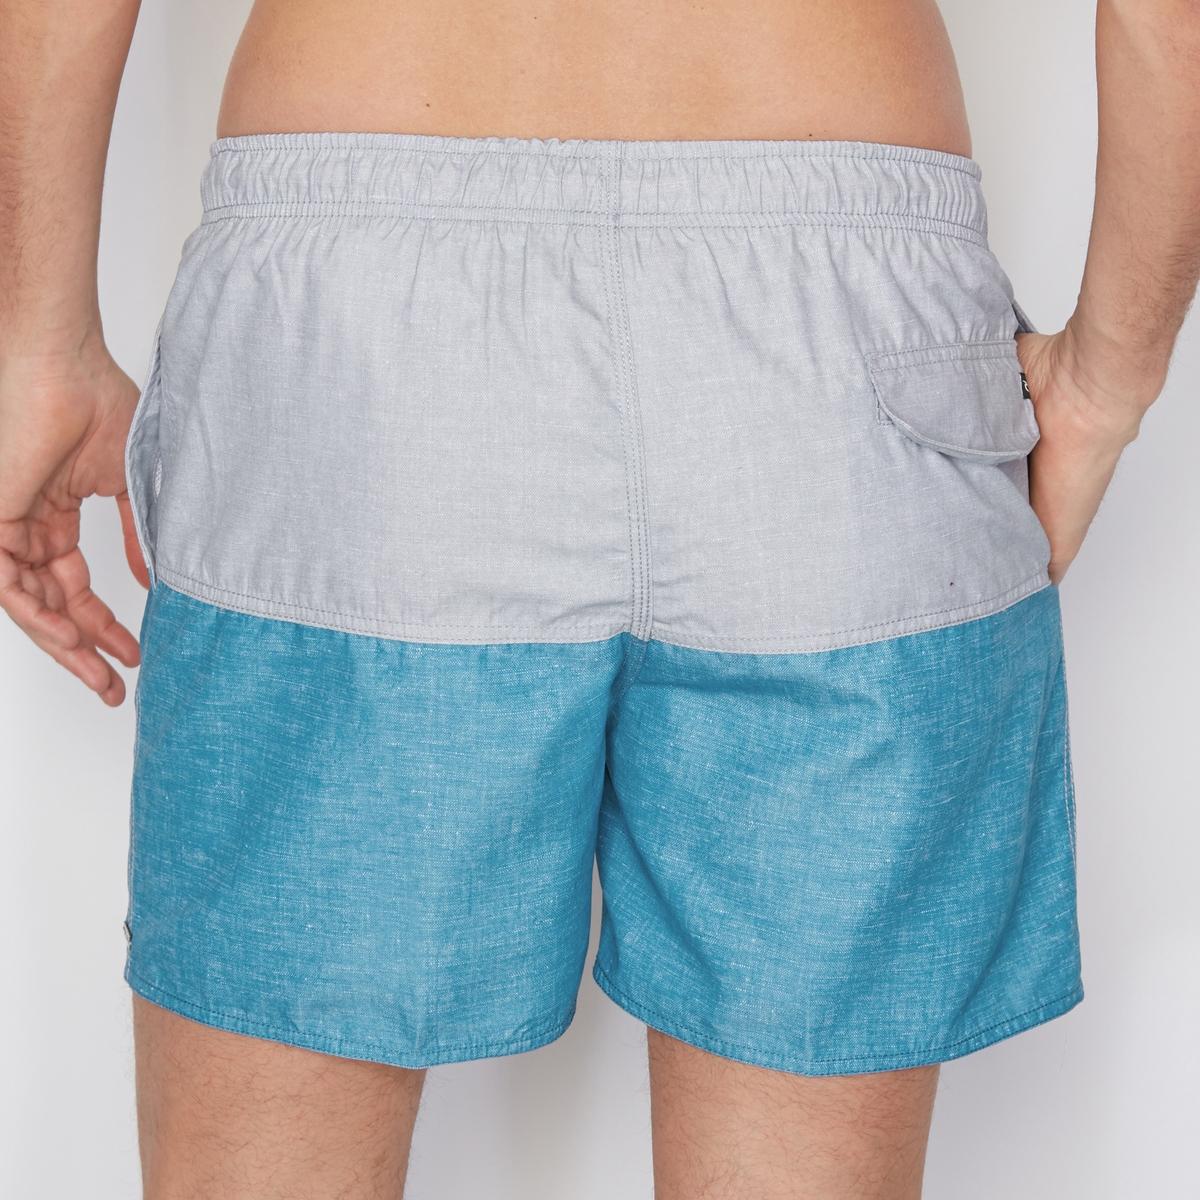 Шорты для плавания двухцветные LAZED SPLIT VOLLEY m nii шорты для плавания